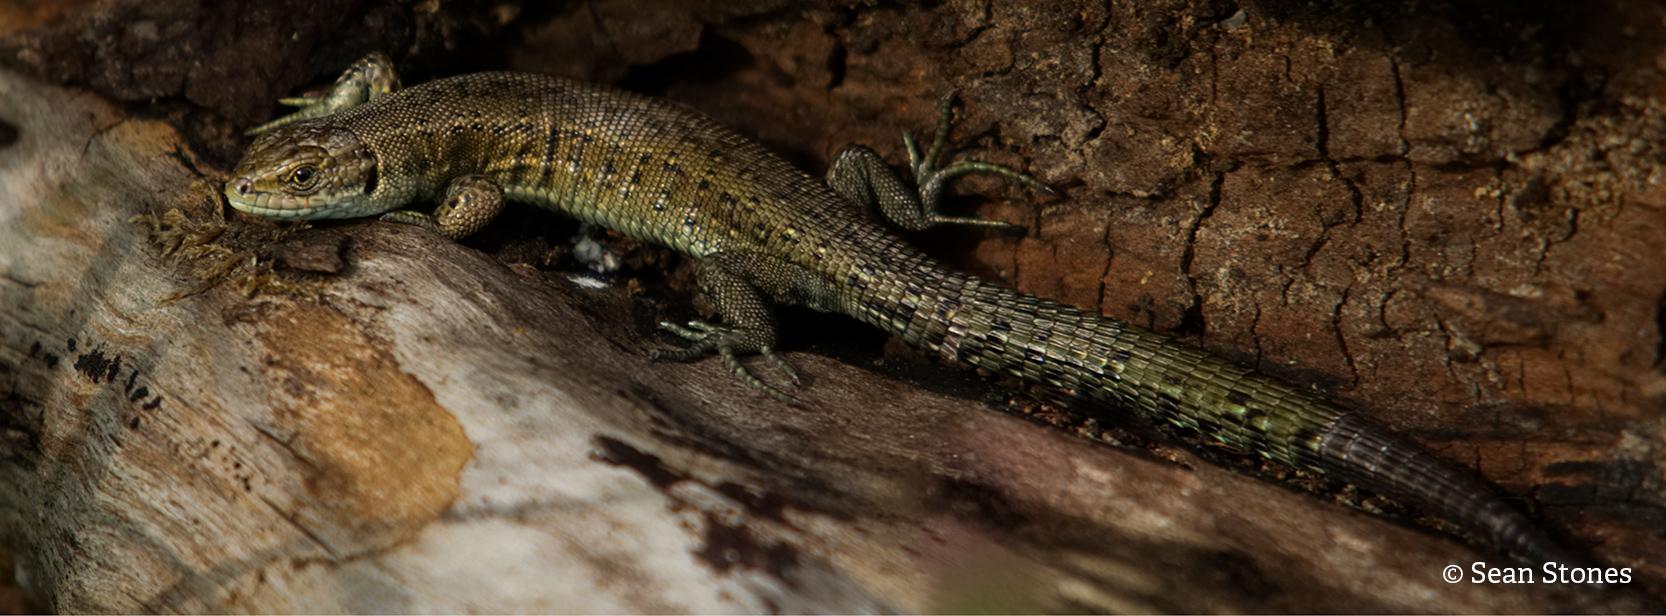 Common lizard seanstones